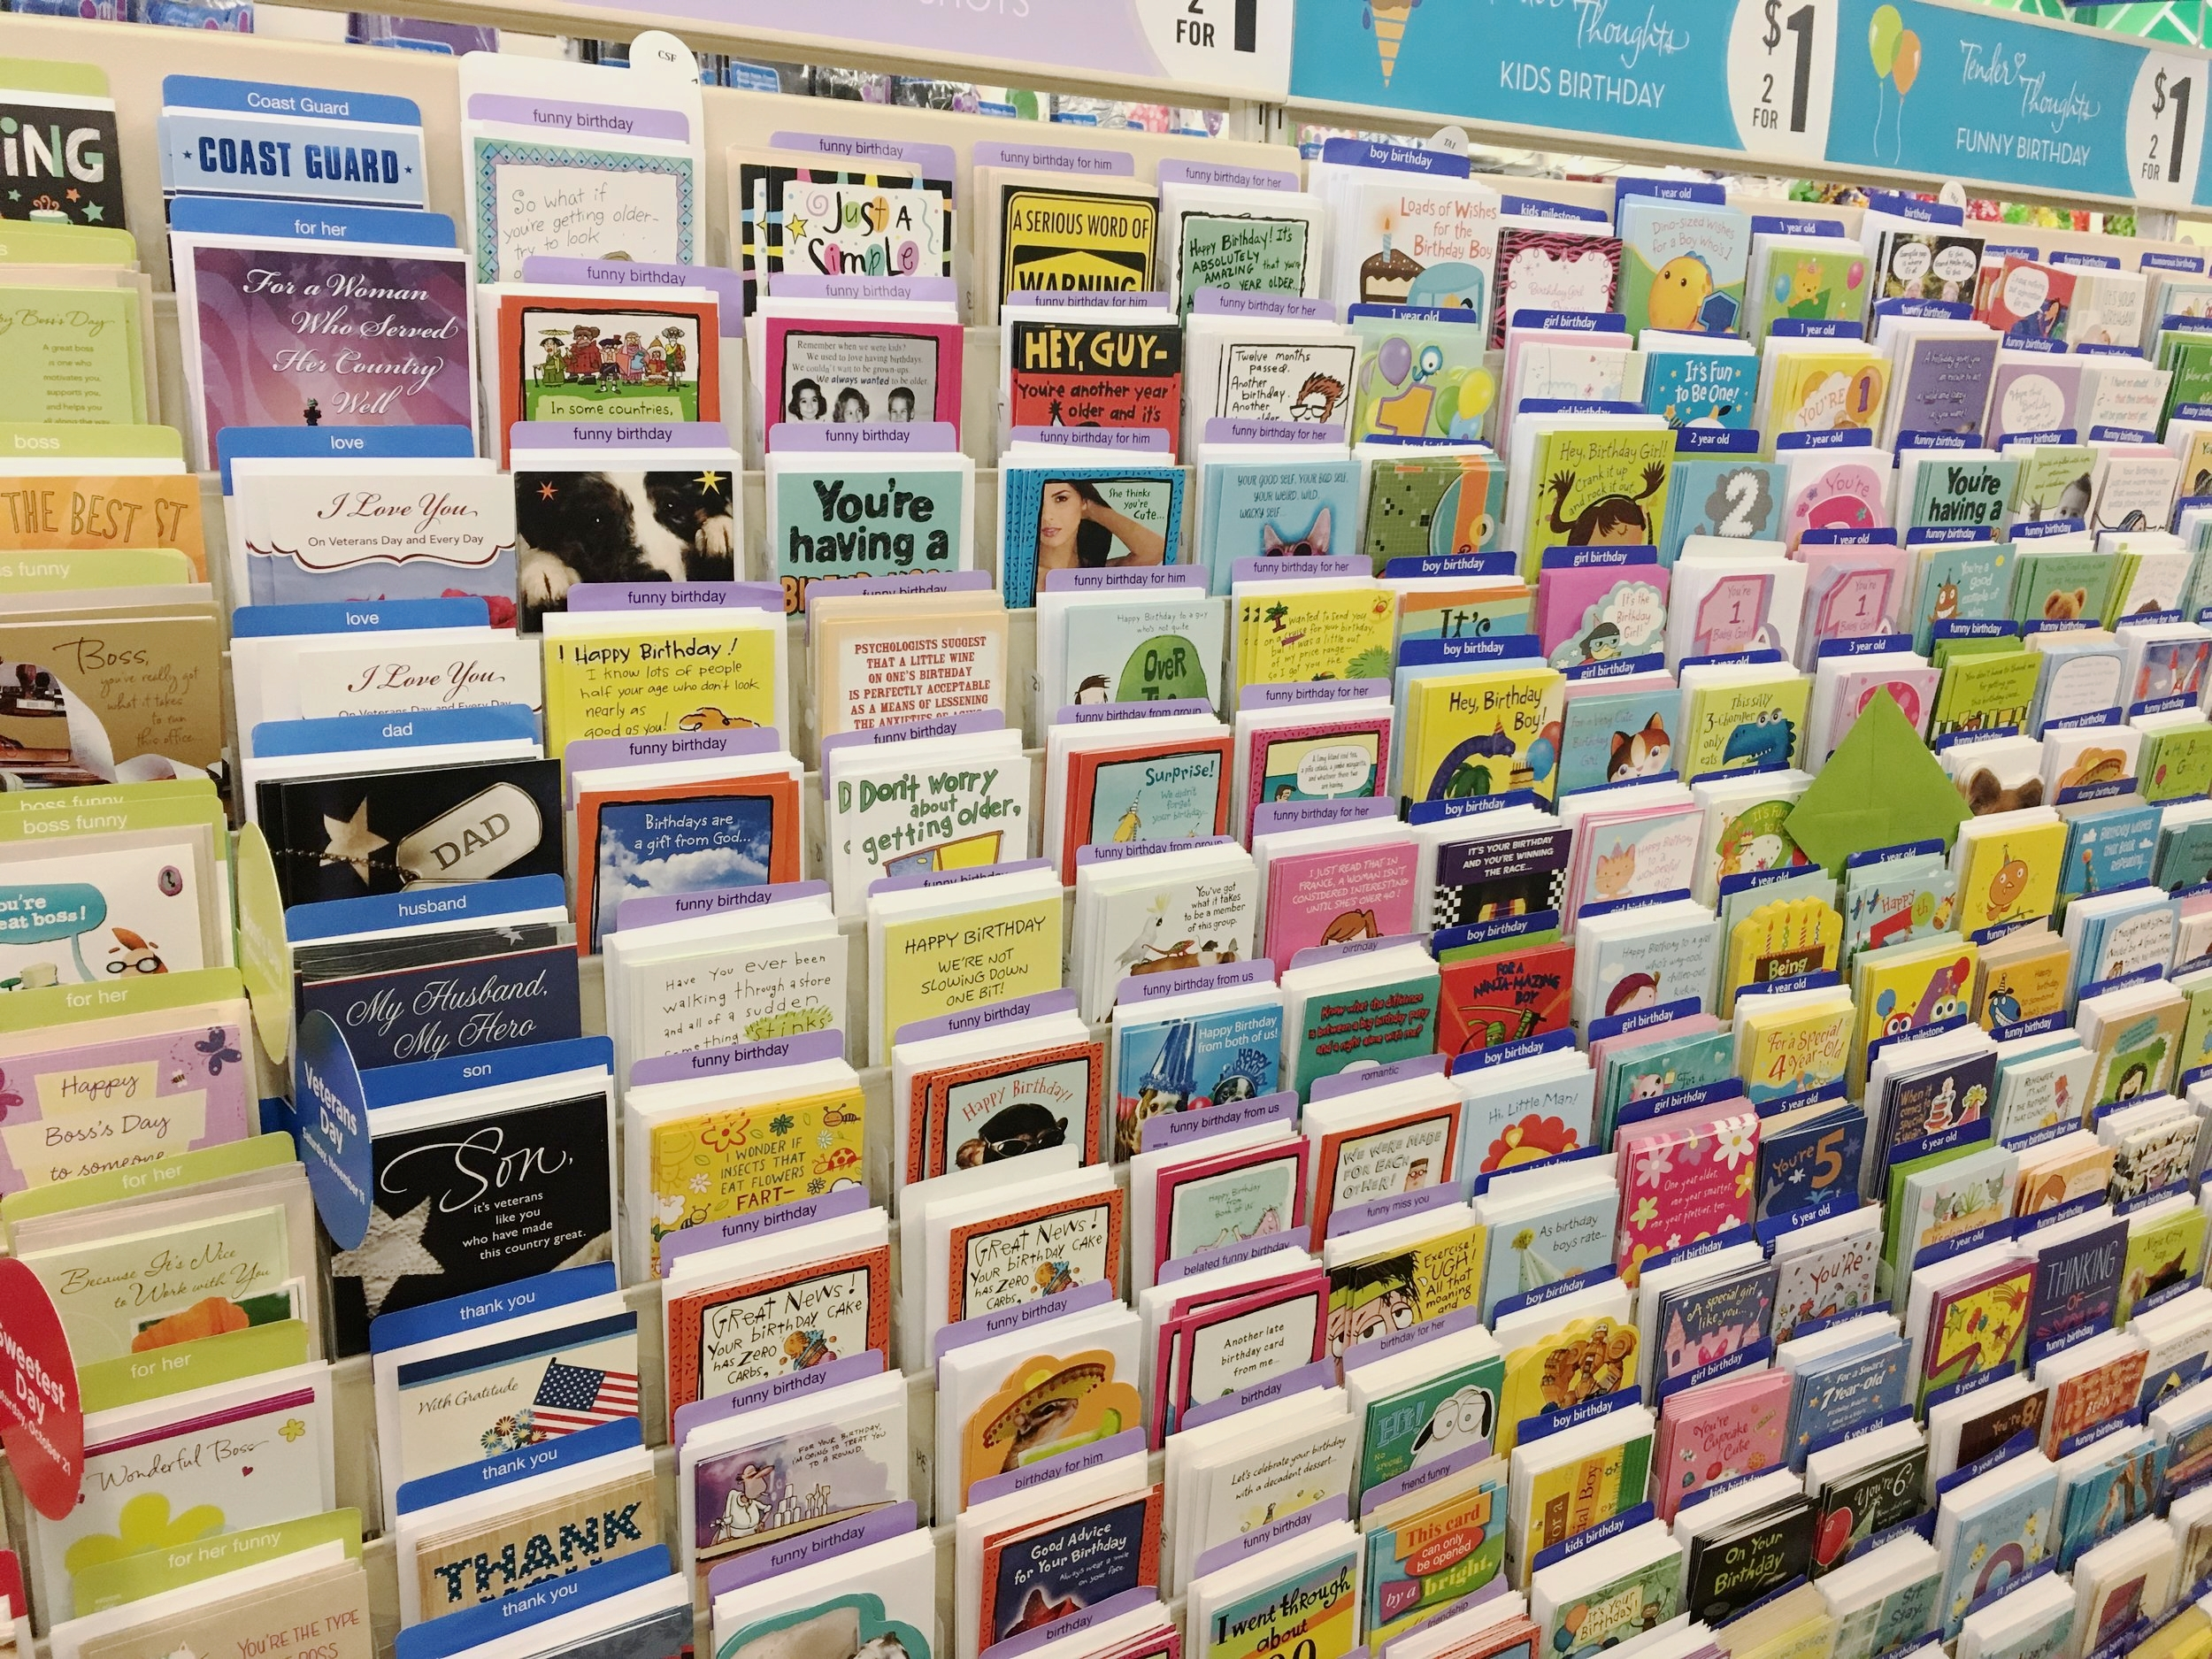 dollar store deals - whatthegirlssay.com